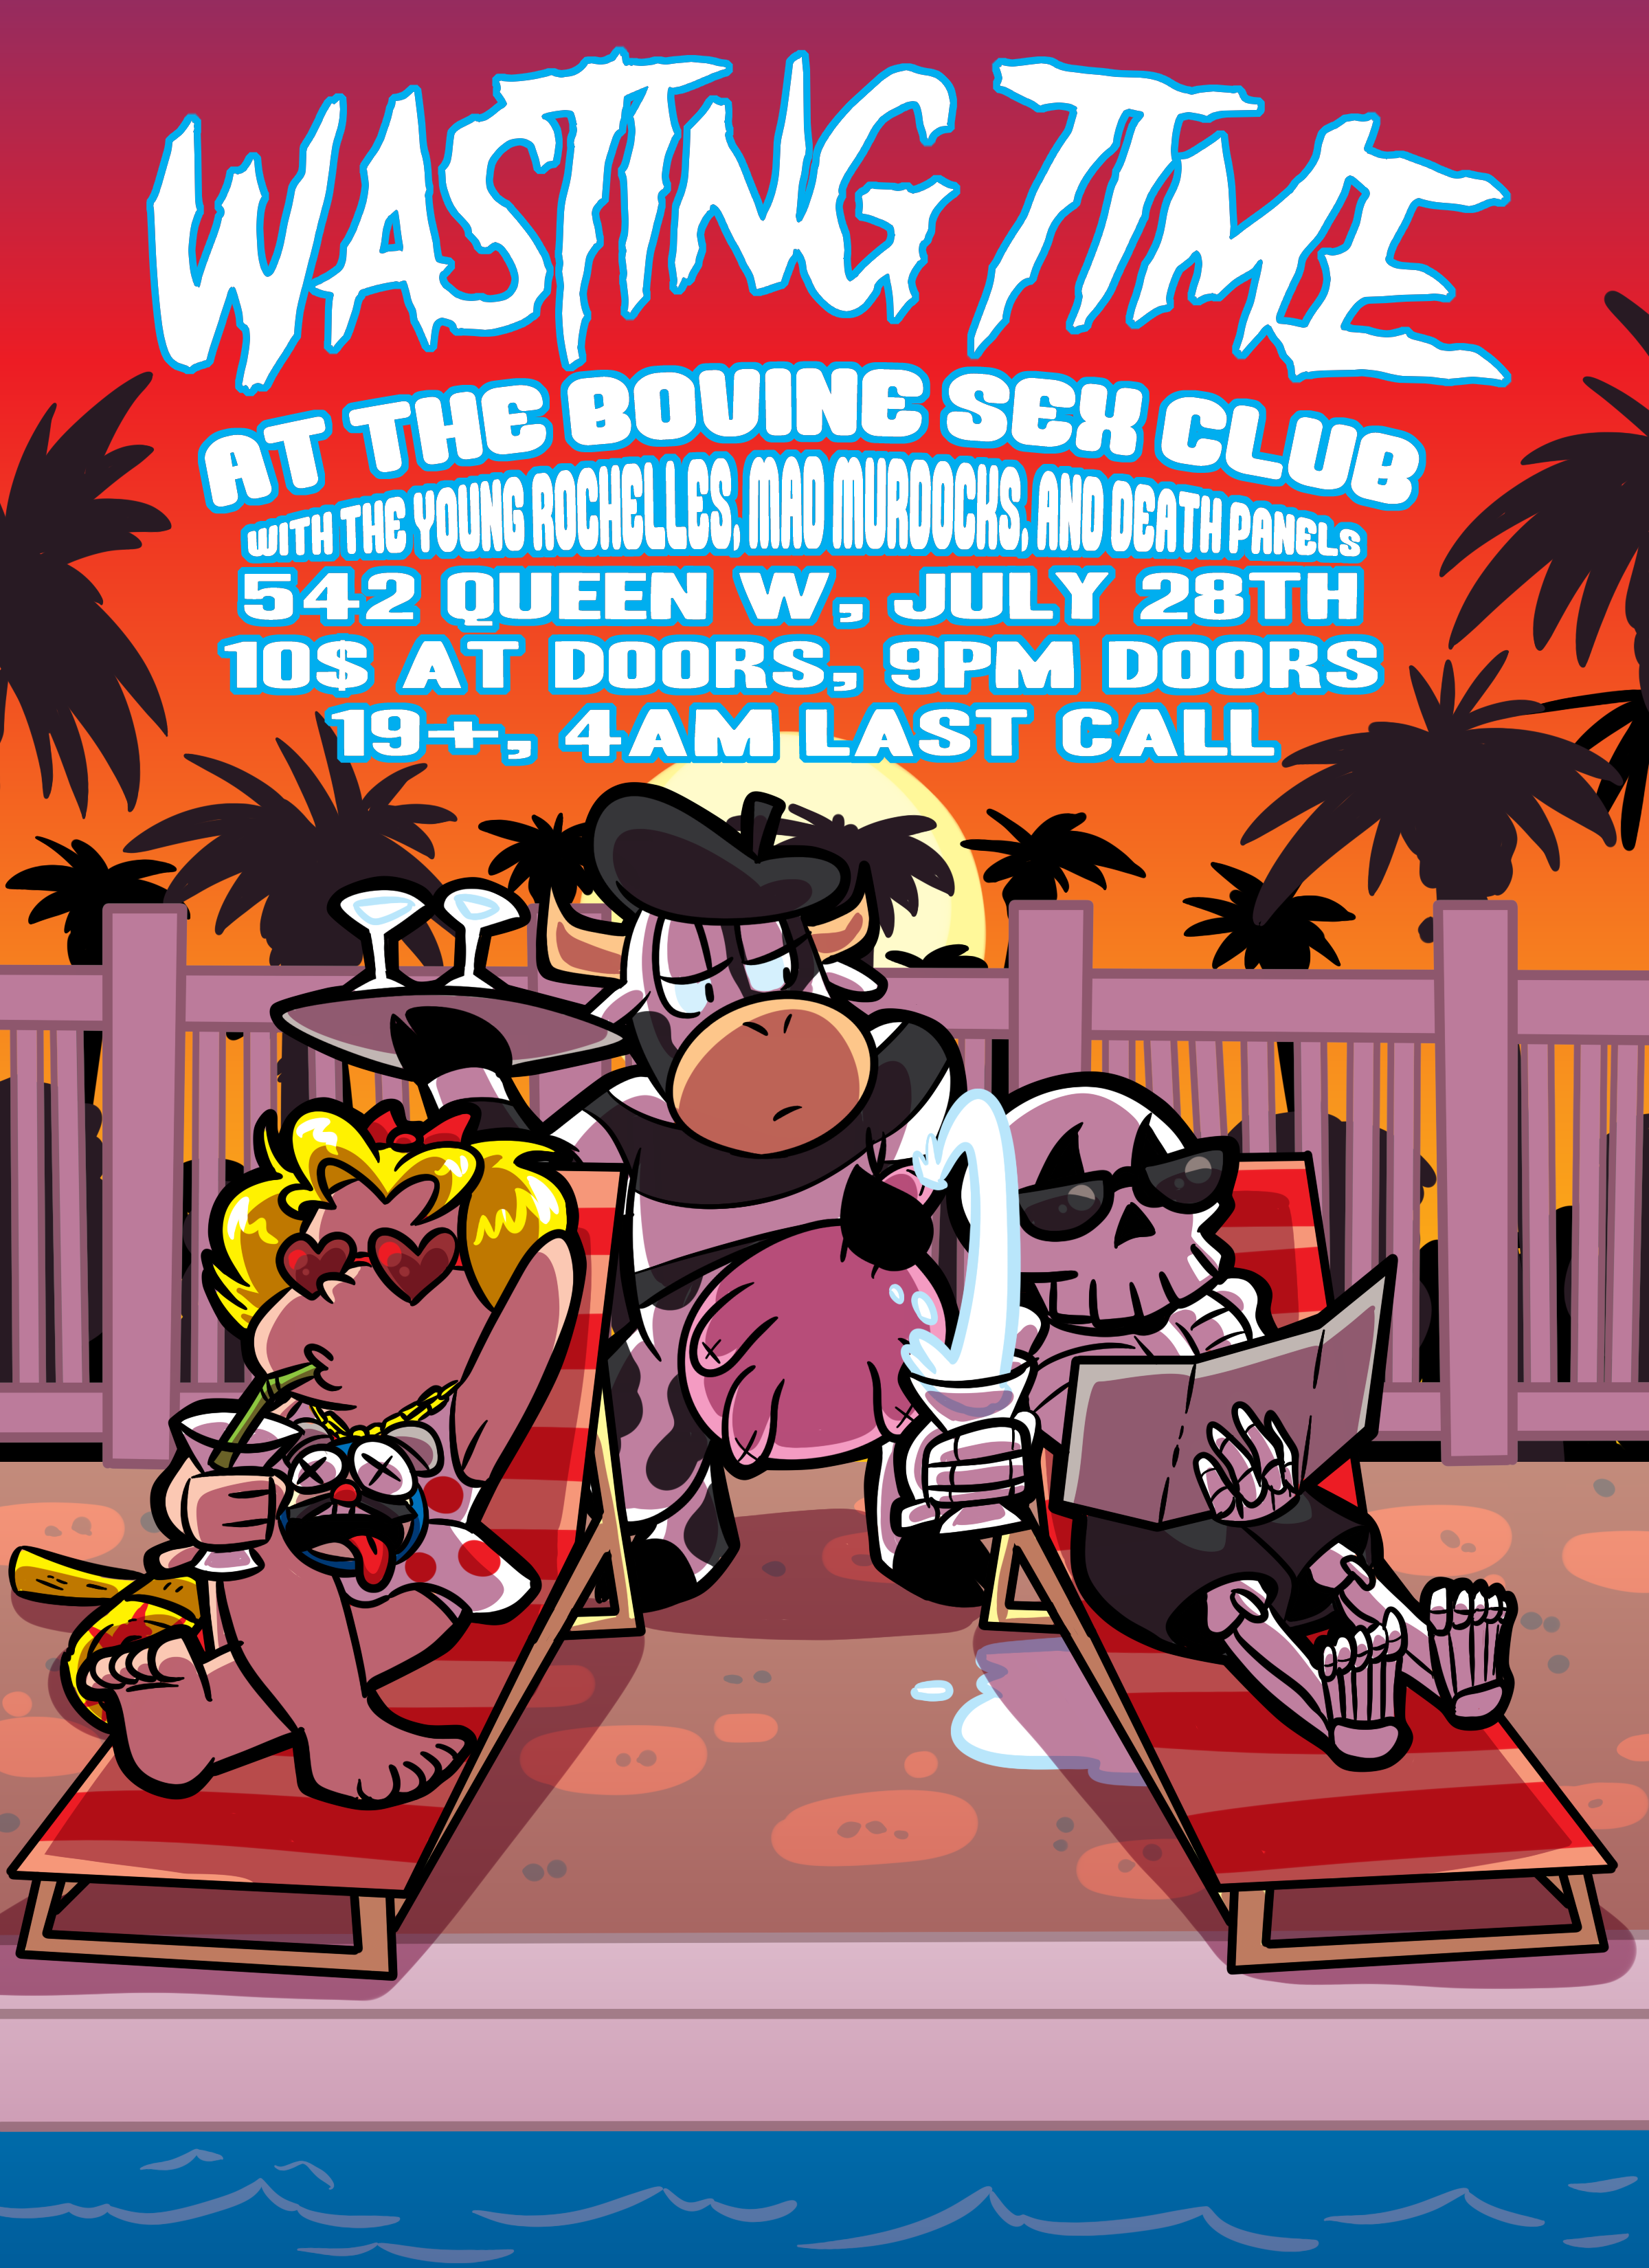 Bovine_Sex_Club_Poster_7-28.png